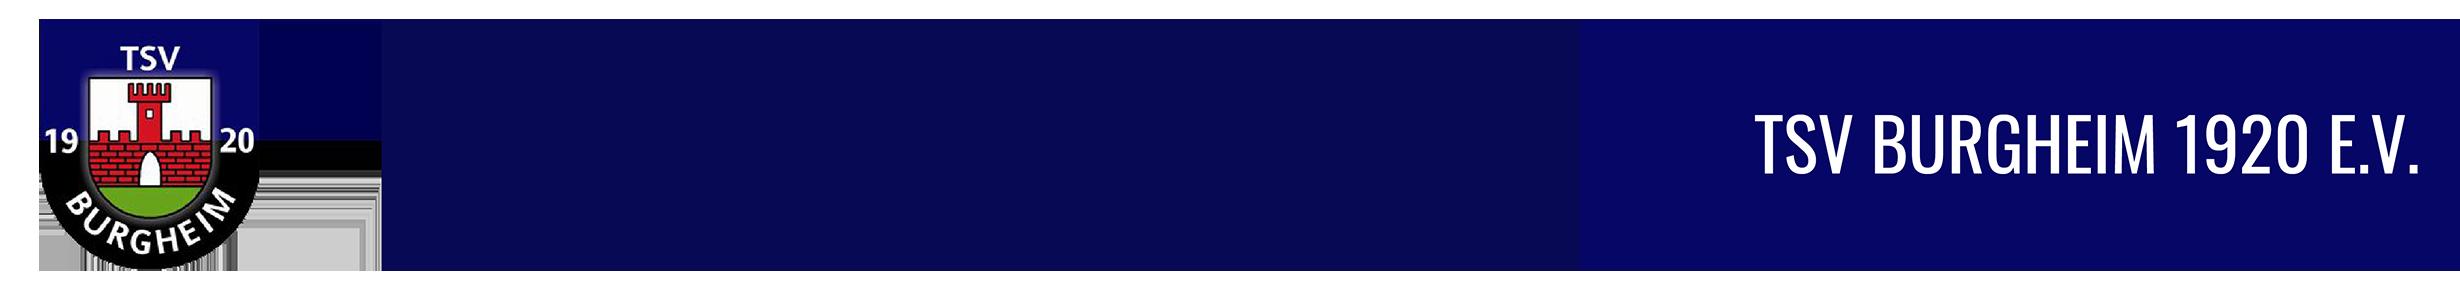 TSV Burgheim 1920 e.V. - Tischtennis